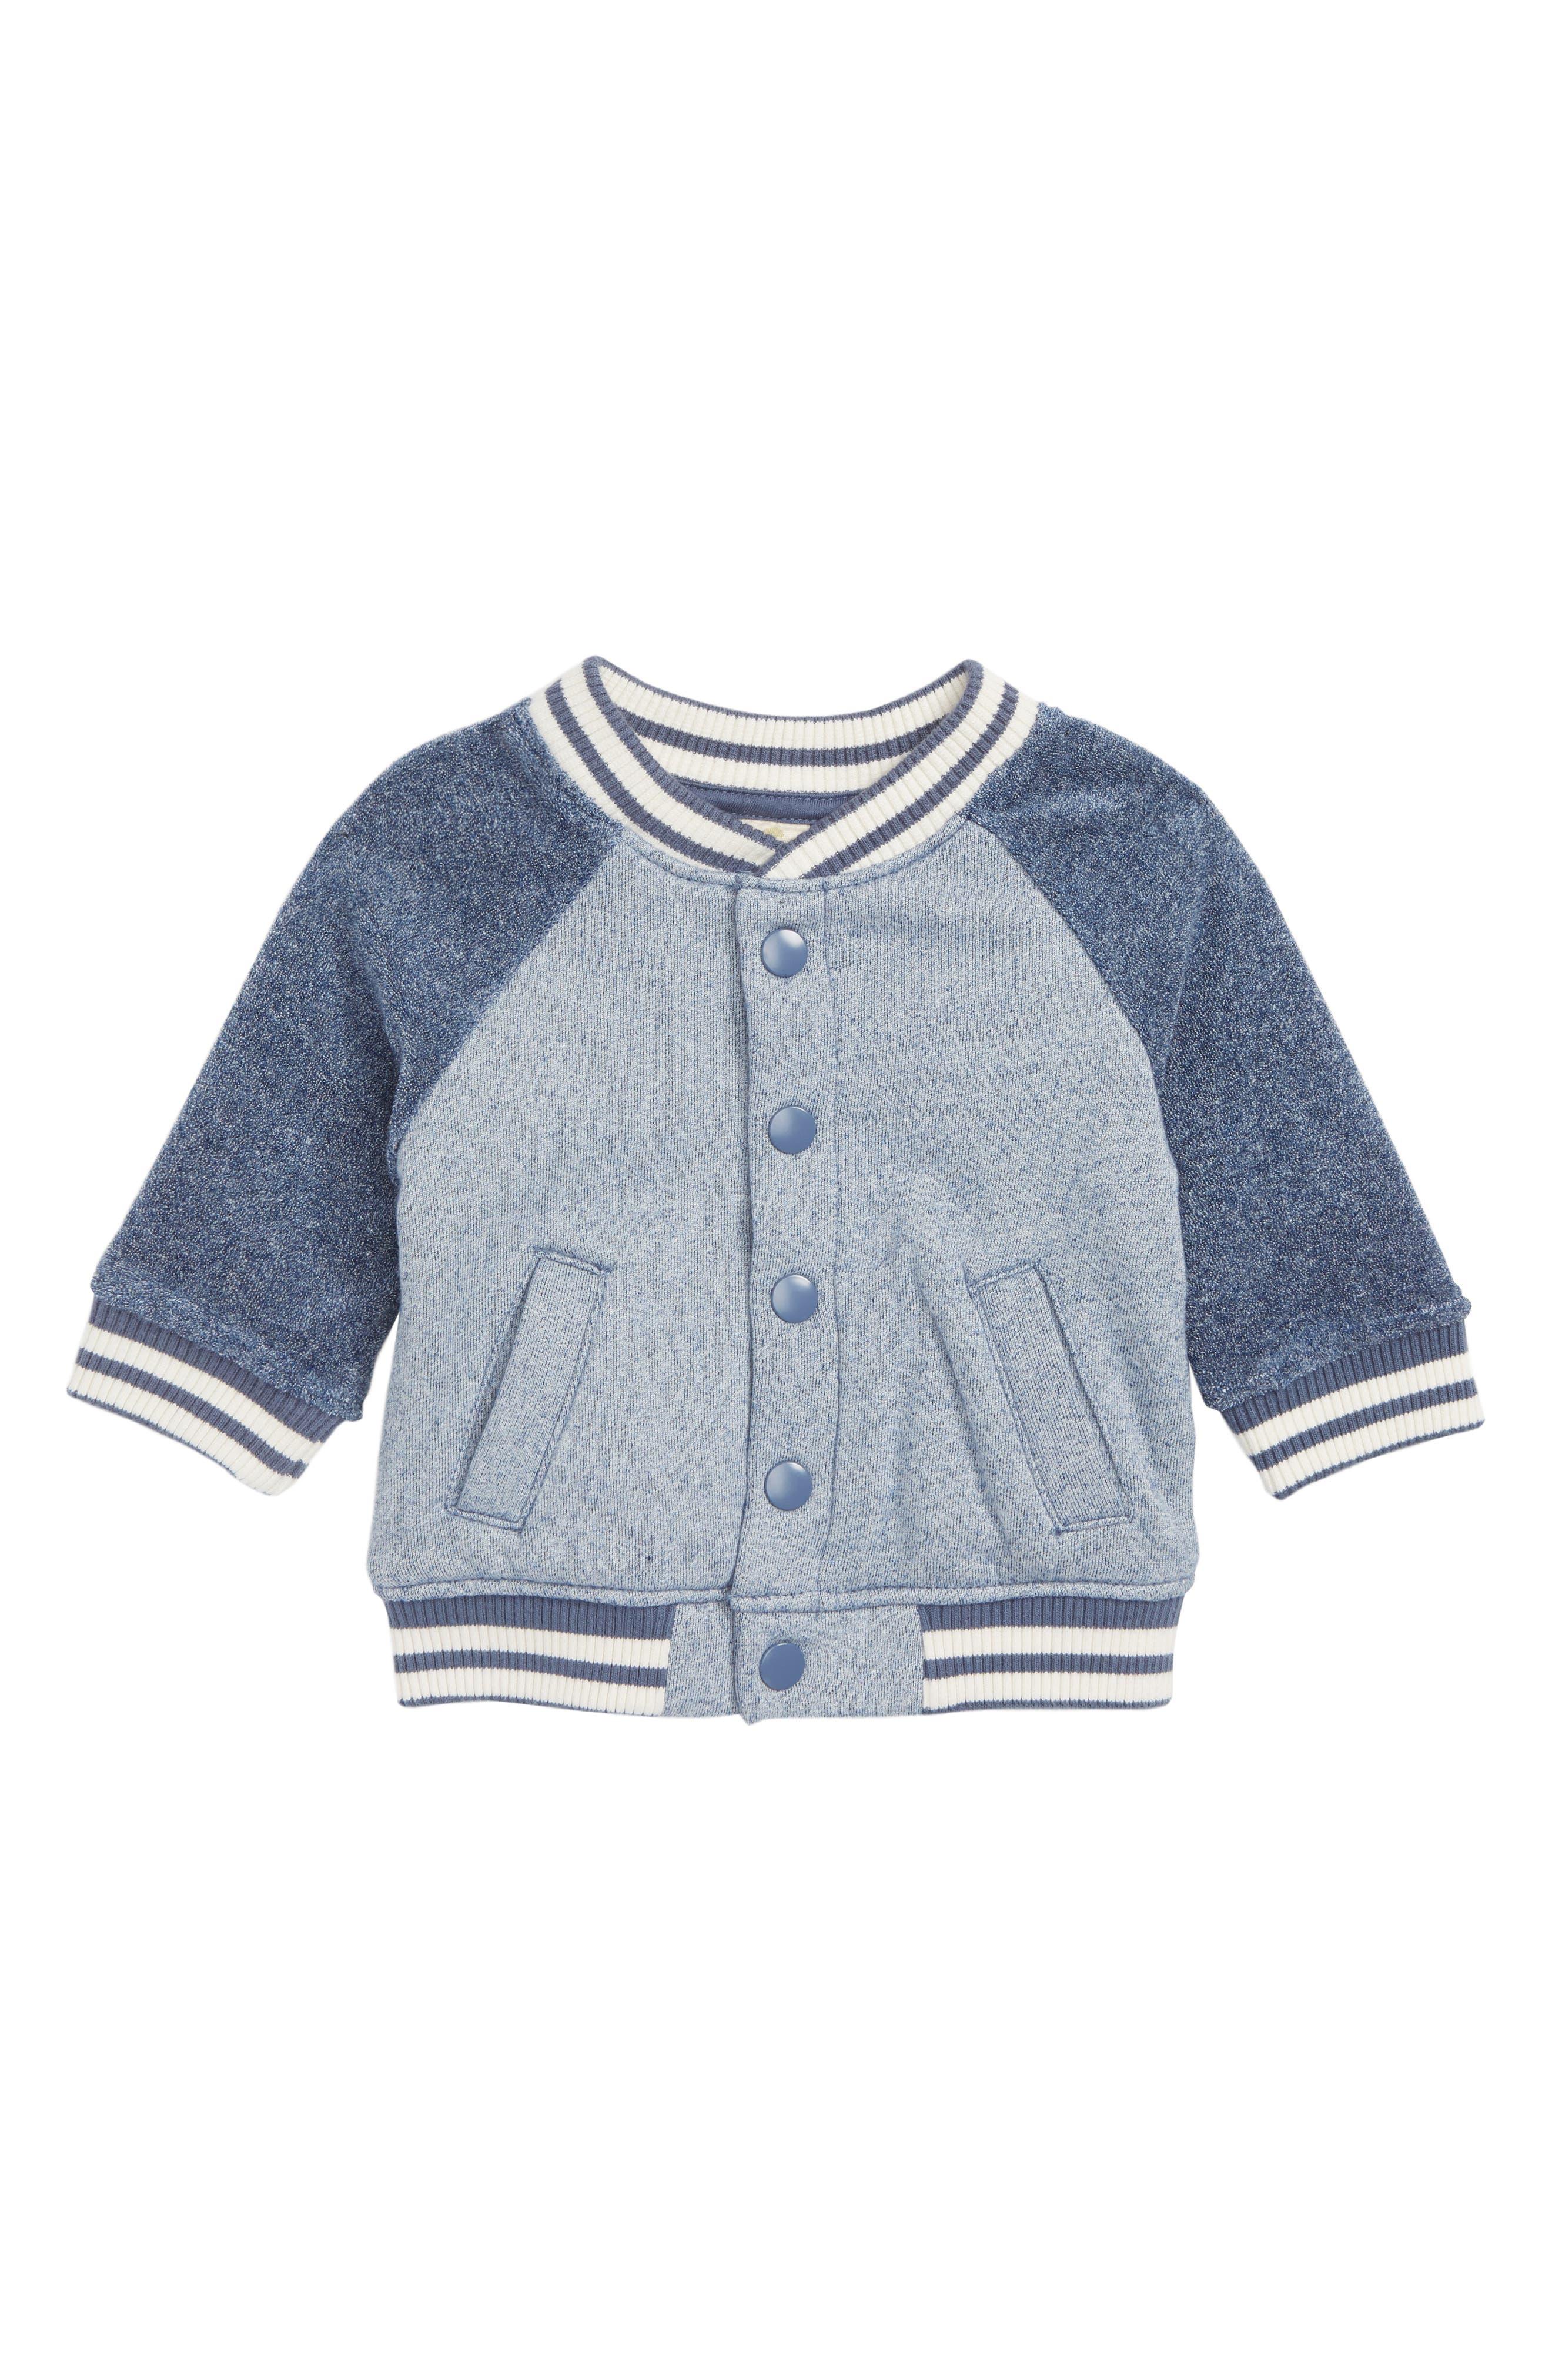 Novelty Varsity Jacket,                         Main,                         color, NAVY DENIM